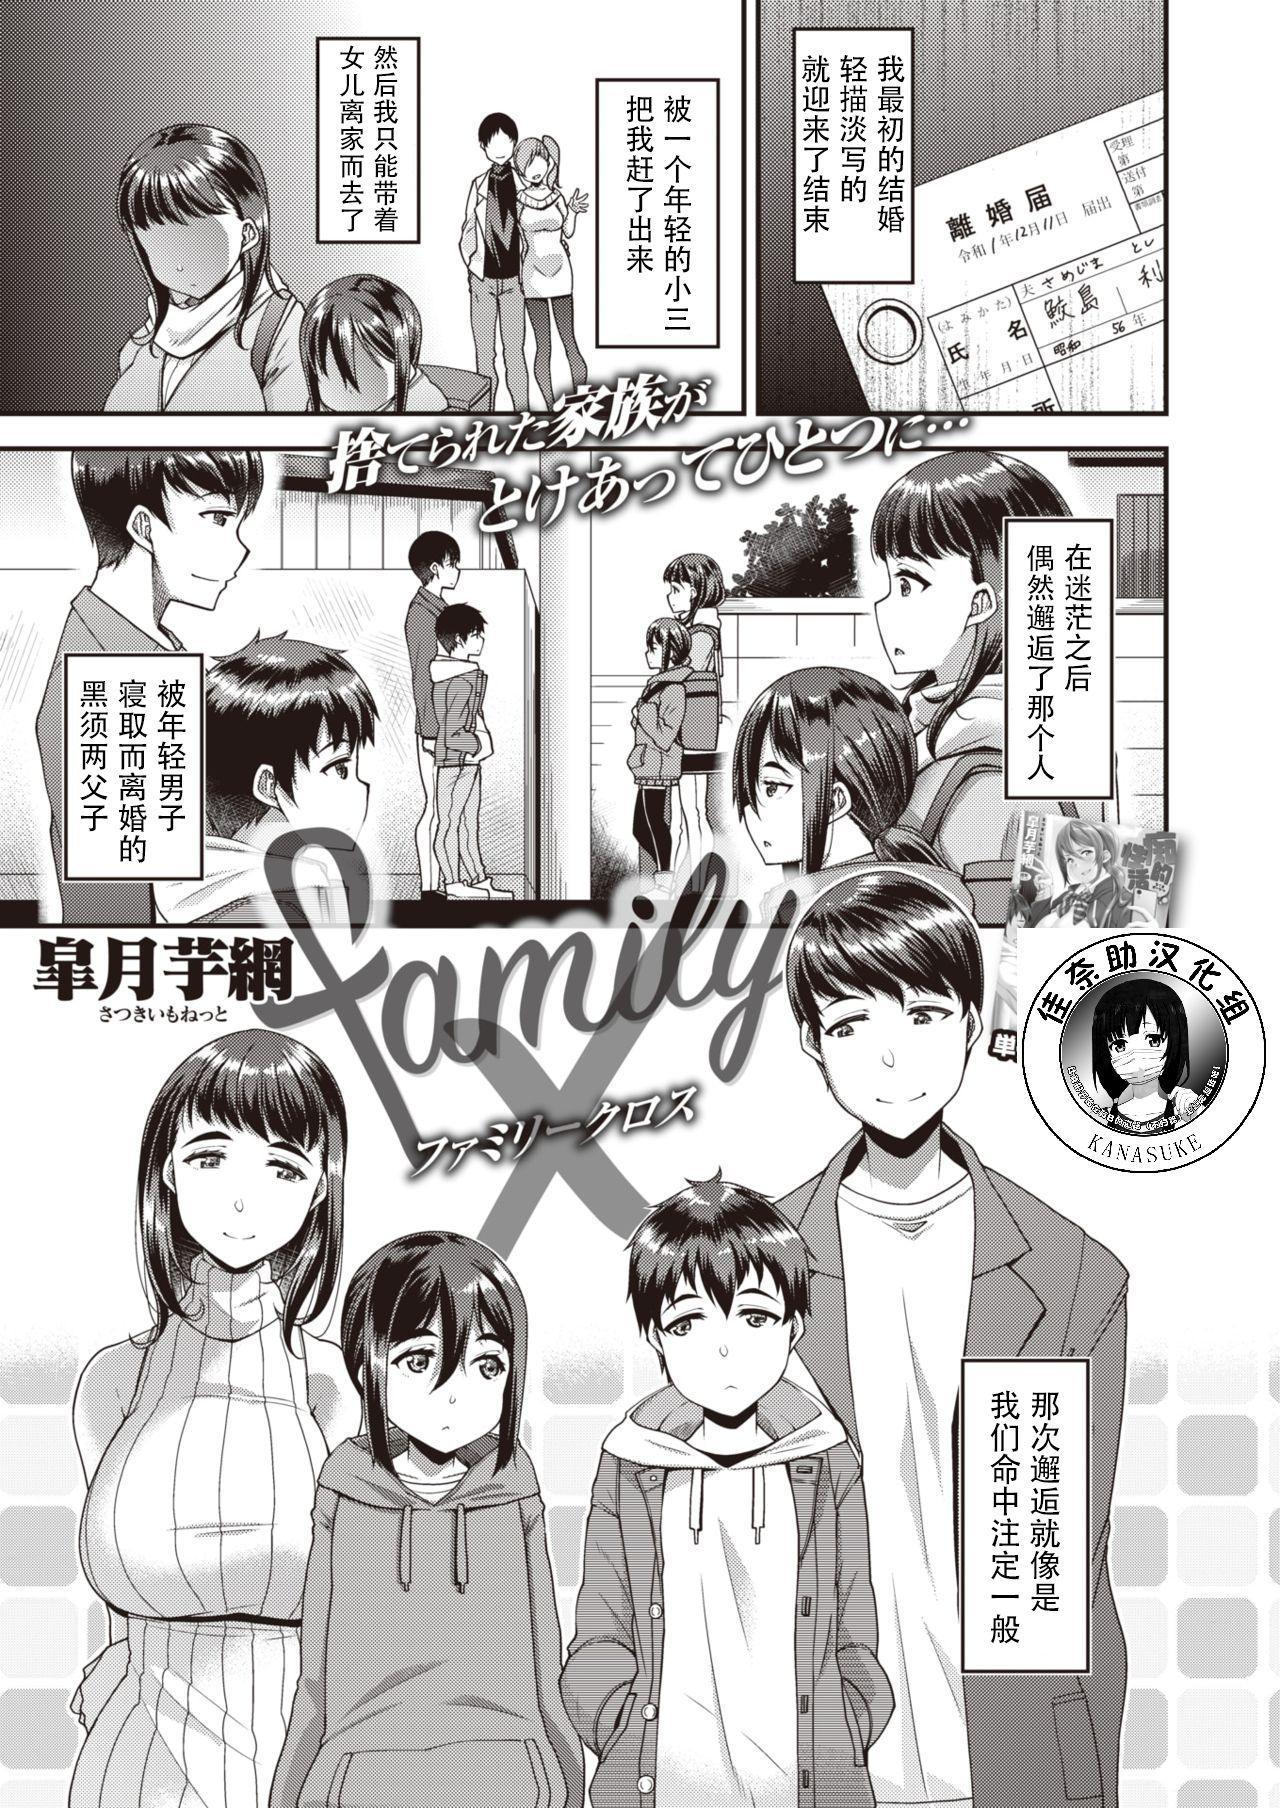 Hentai Family